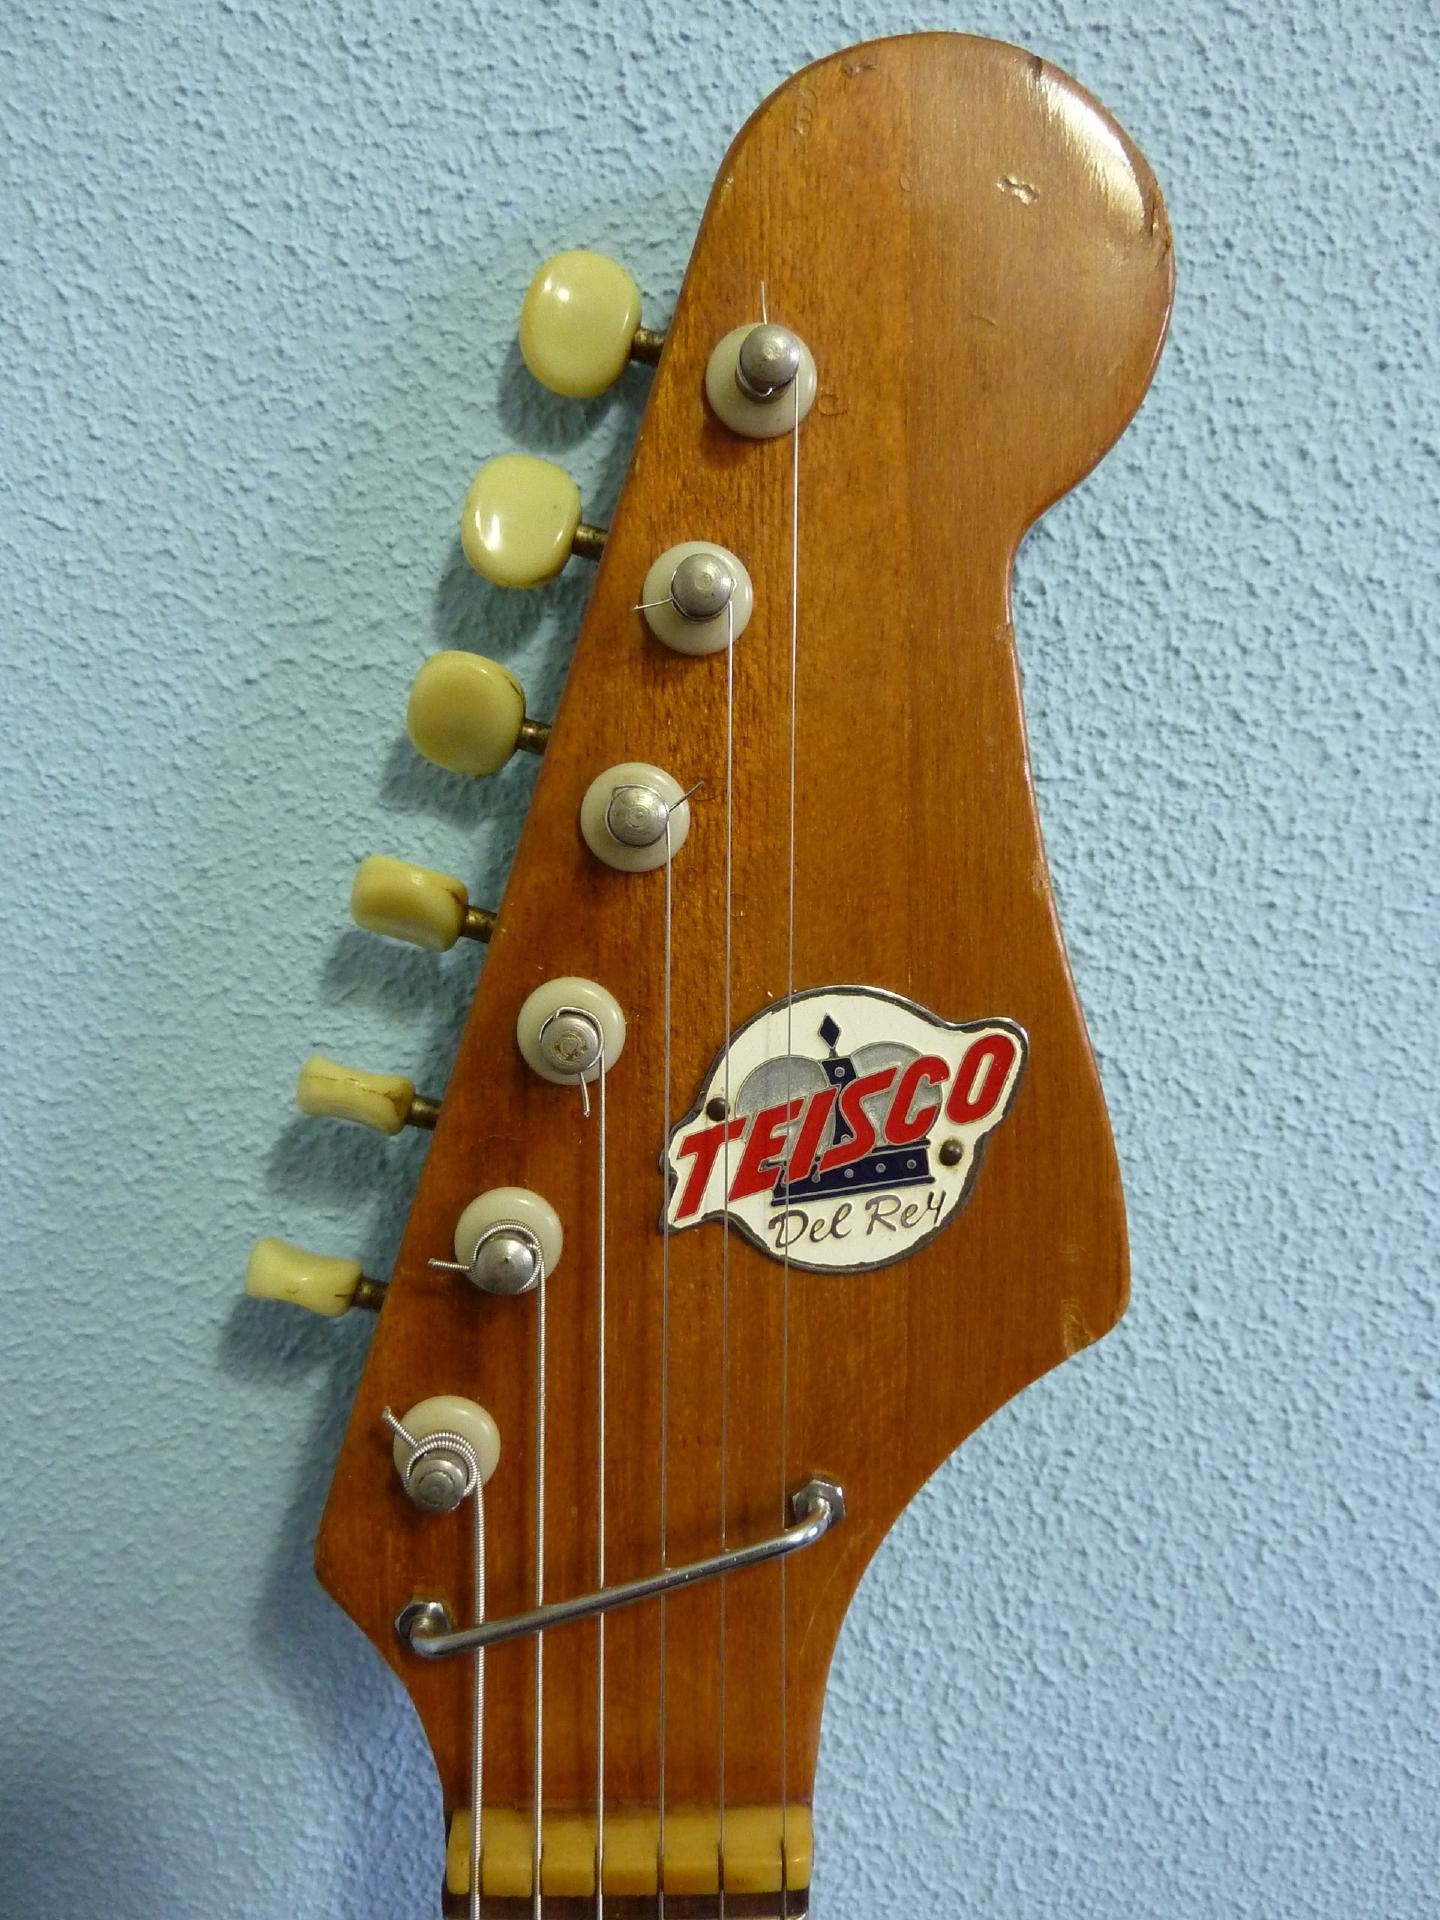 Teisco Del Rey Et 210 Electric Guitar Buy Vintage Teisco